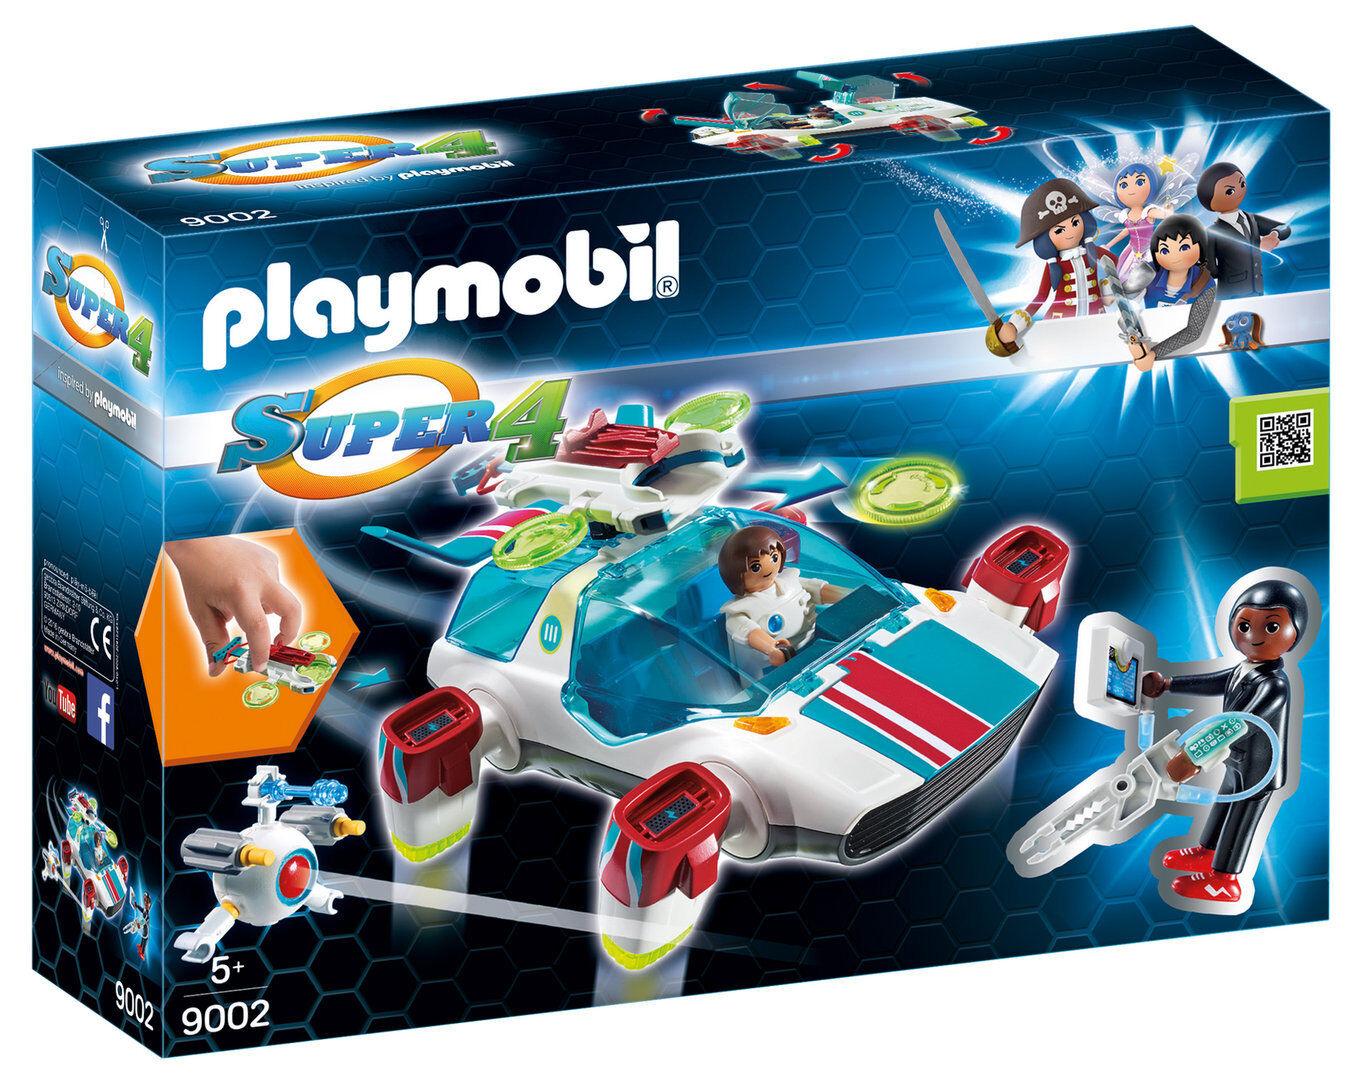 Playmobil 9002 - FulguriX FulguriX FulguriX con Agente Gene - NUEVO 22f65f